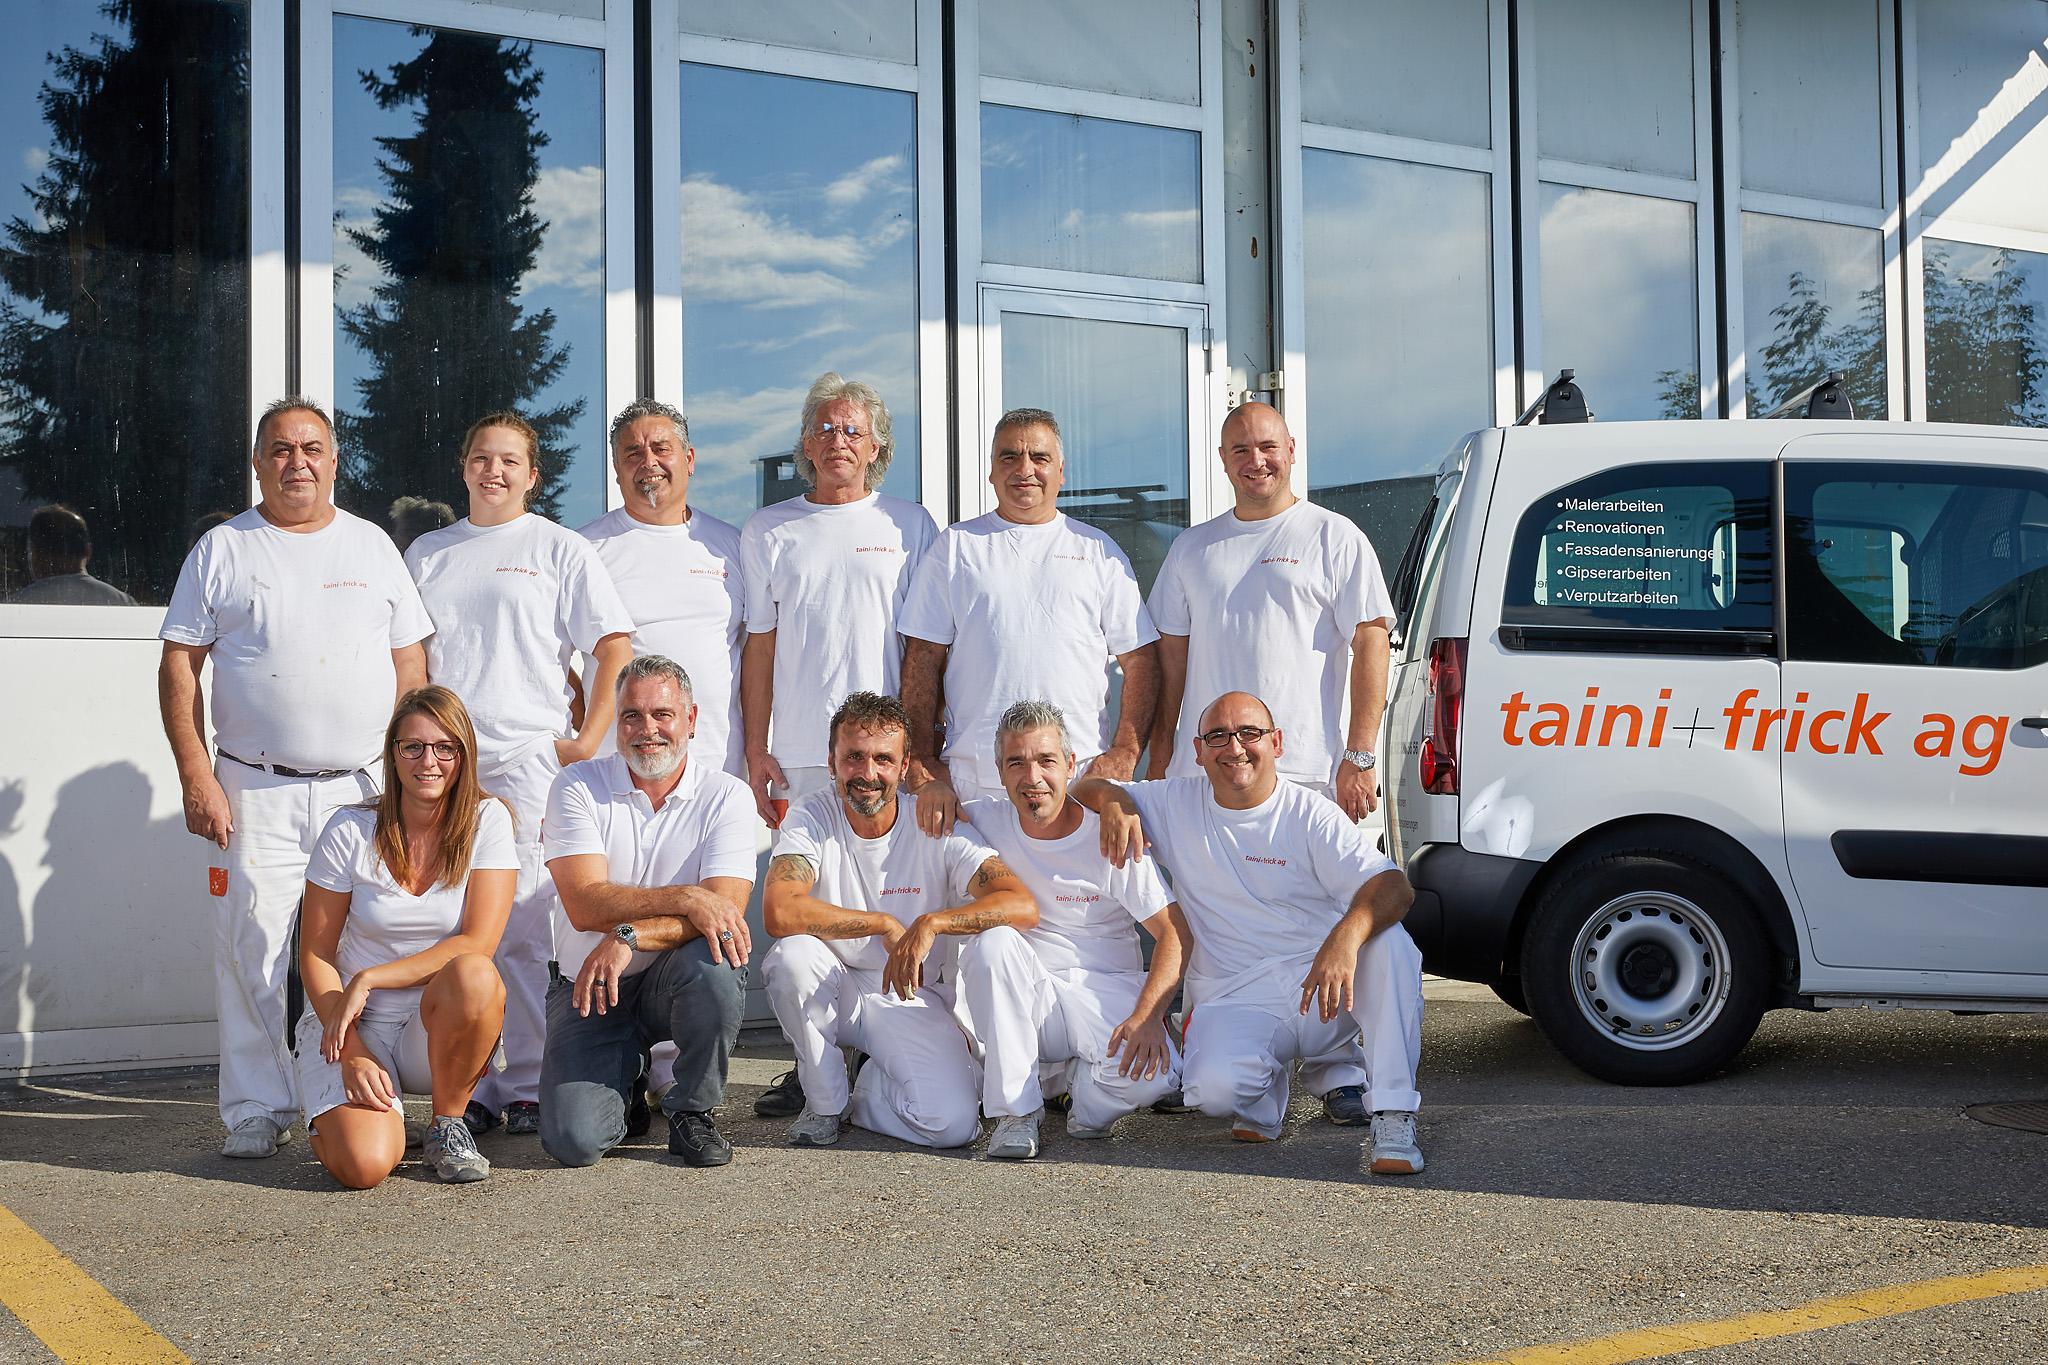 Taini-Frick Biel